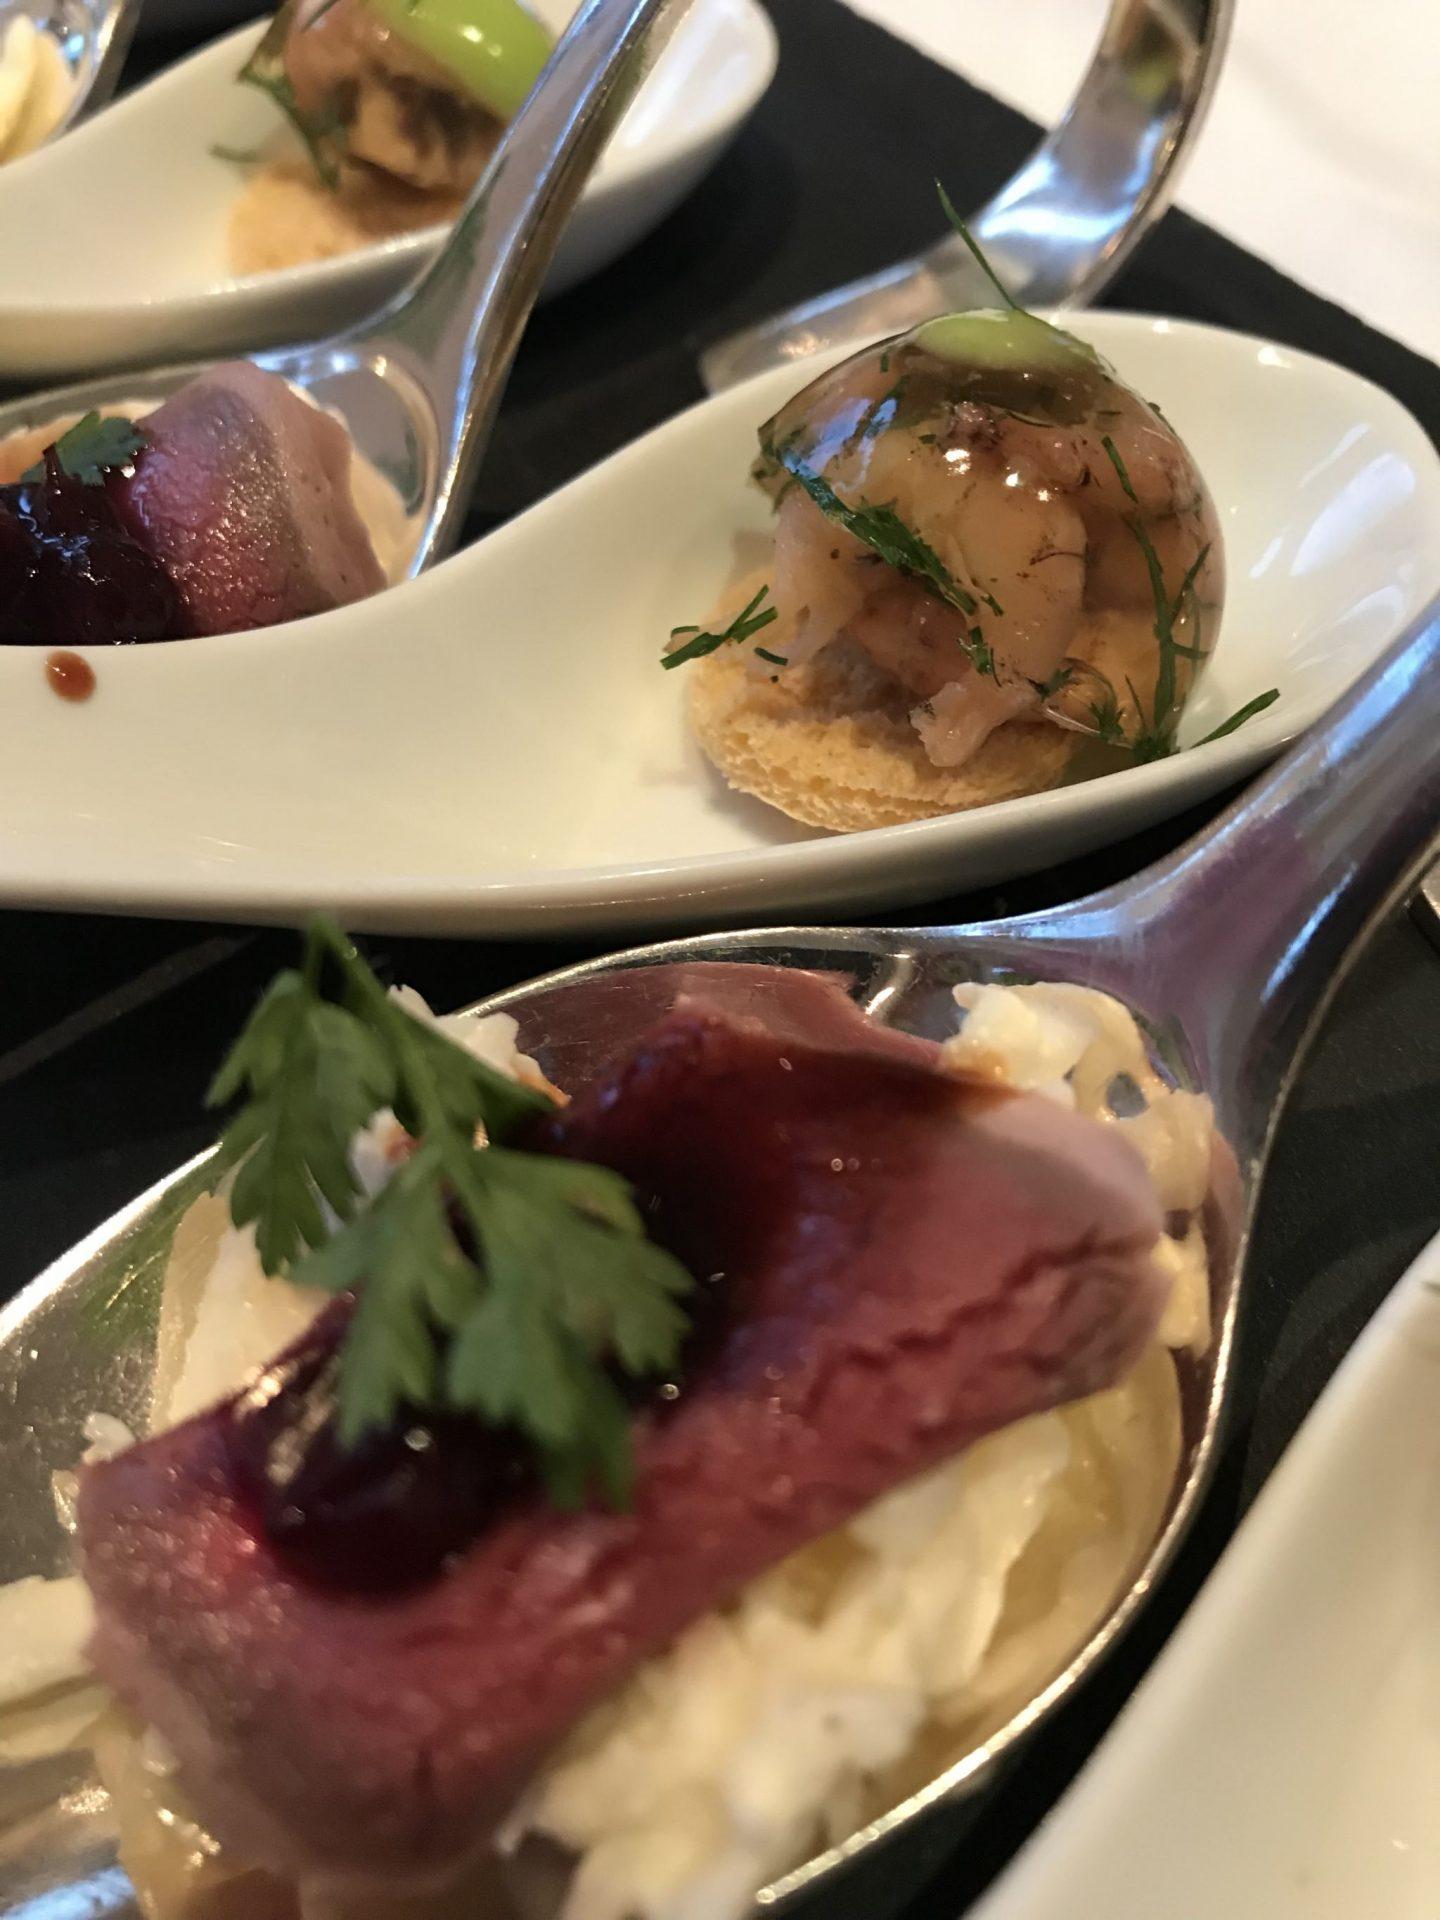 Gruß der Küche Erfahrung Wilbrand Post Odenthal Foodblog Sternestulle